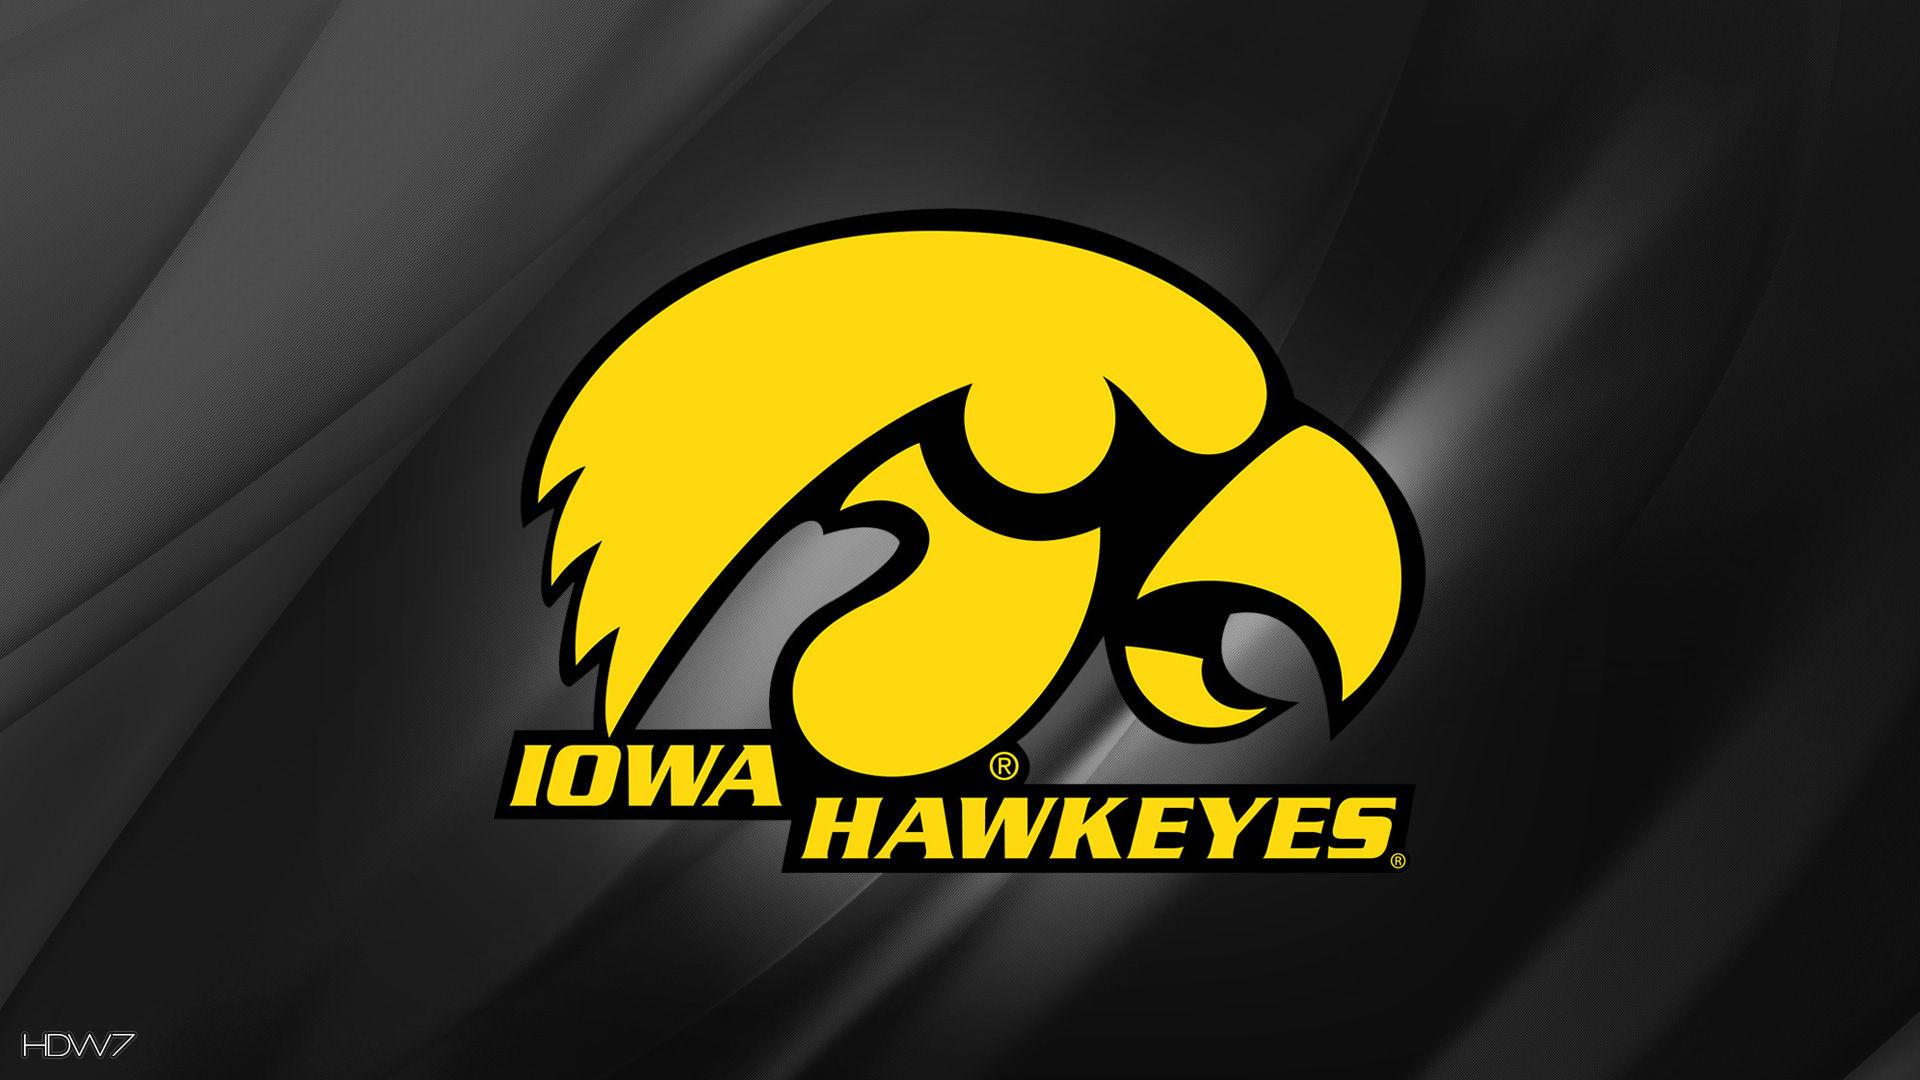 Iowa Hawkeye Screensavers and Wallpaper 39 images 1920x1080